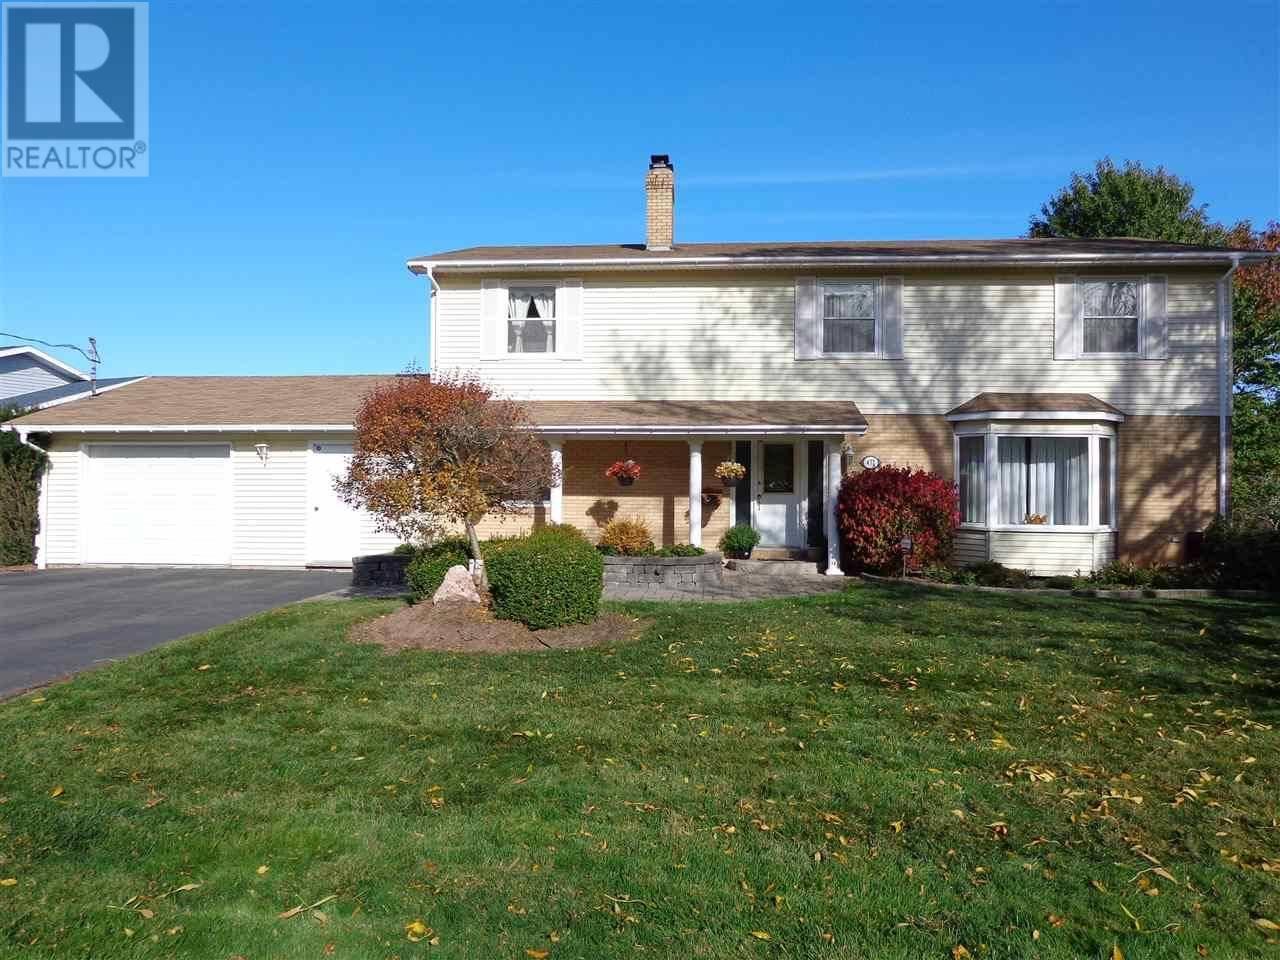 House for sale at 477 Terrace St New Glasgow Nova Scotia - MLS: 202007033